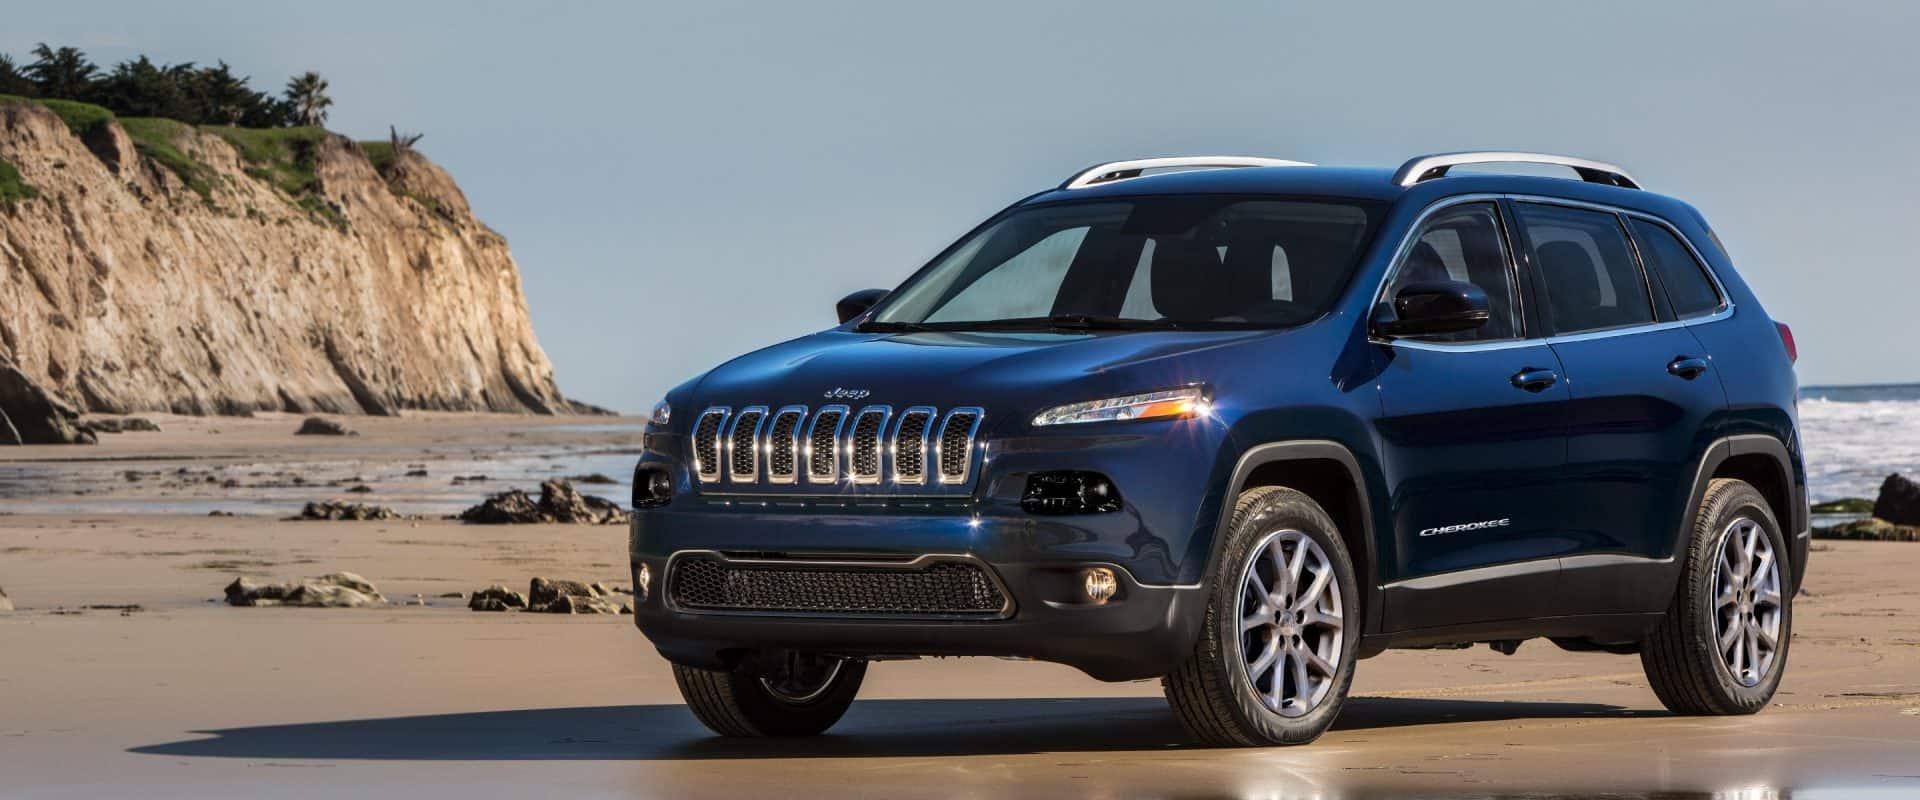 Jeep Grand Wagoneer >> 2018 Jeep Cherokee - Compact SUV Ready For Adventure